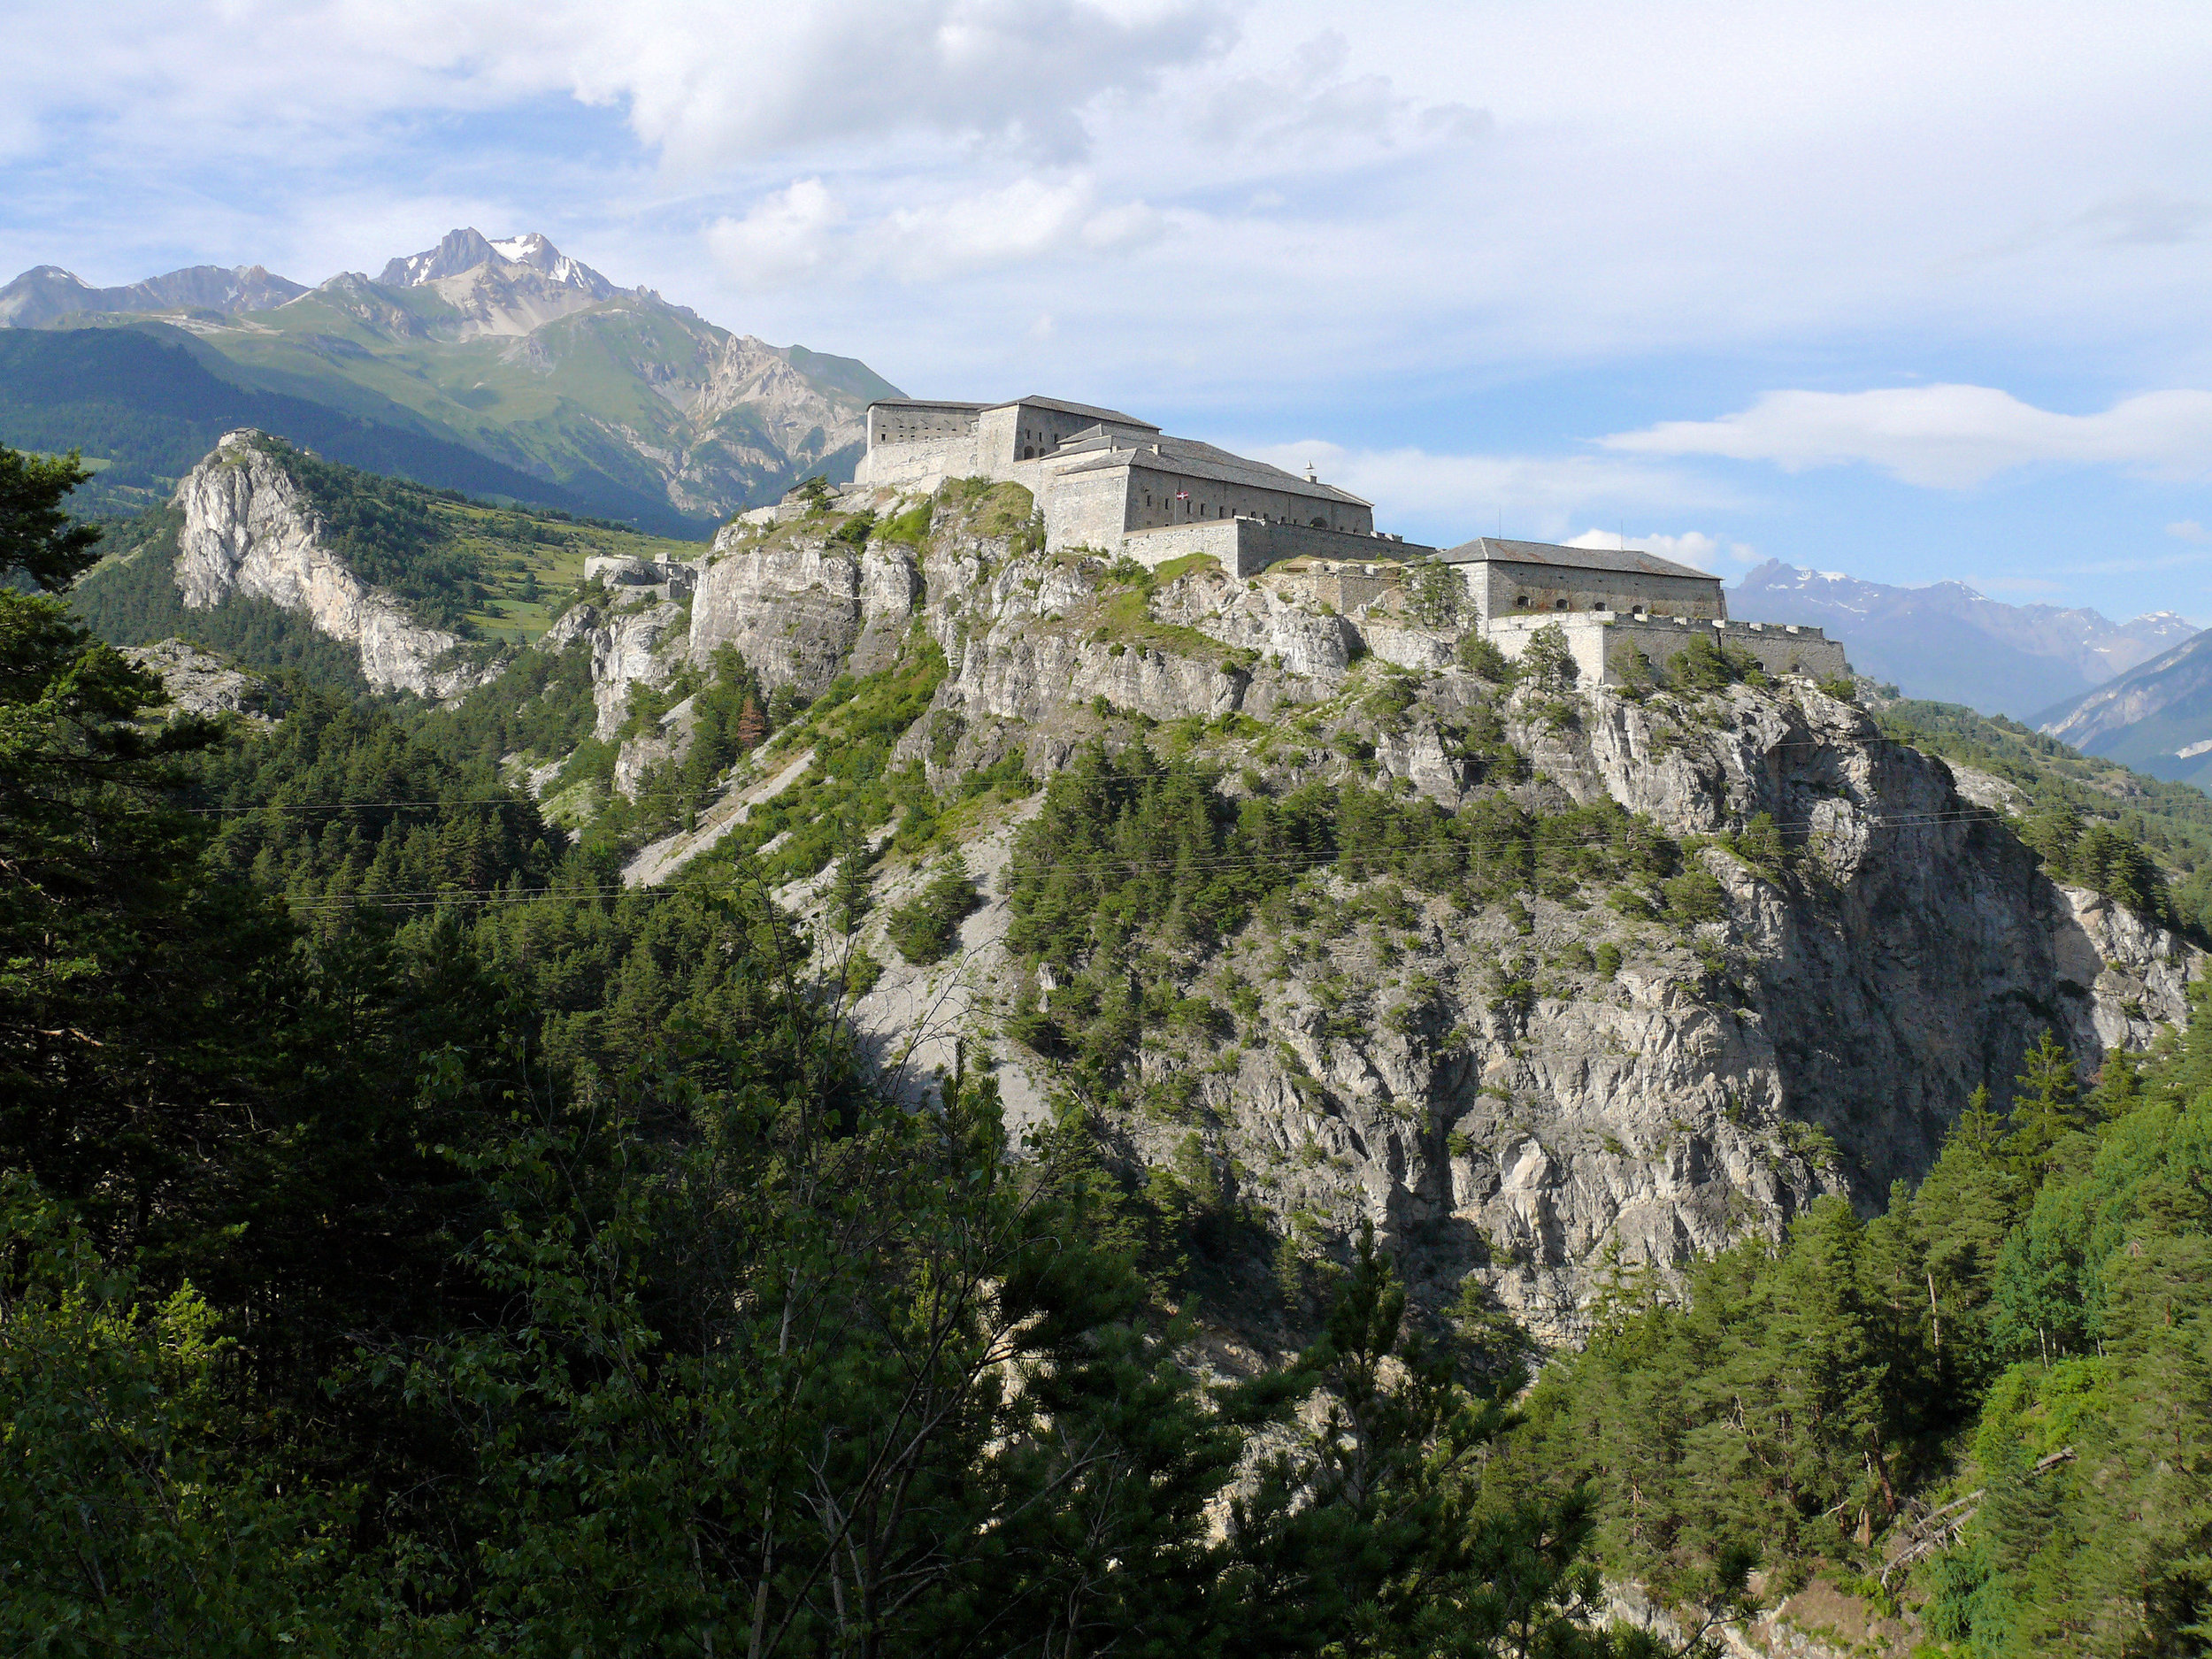 Switzerland, the Fort Knox of Europe